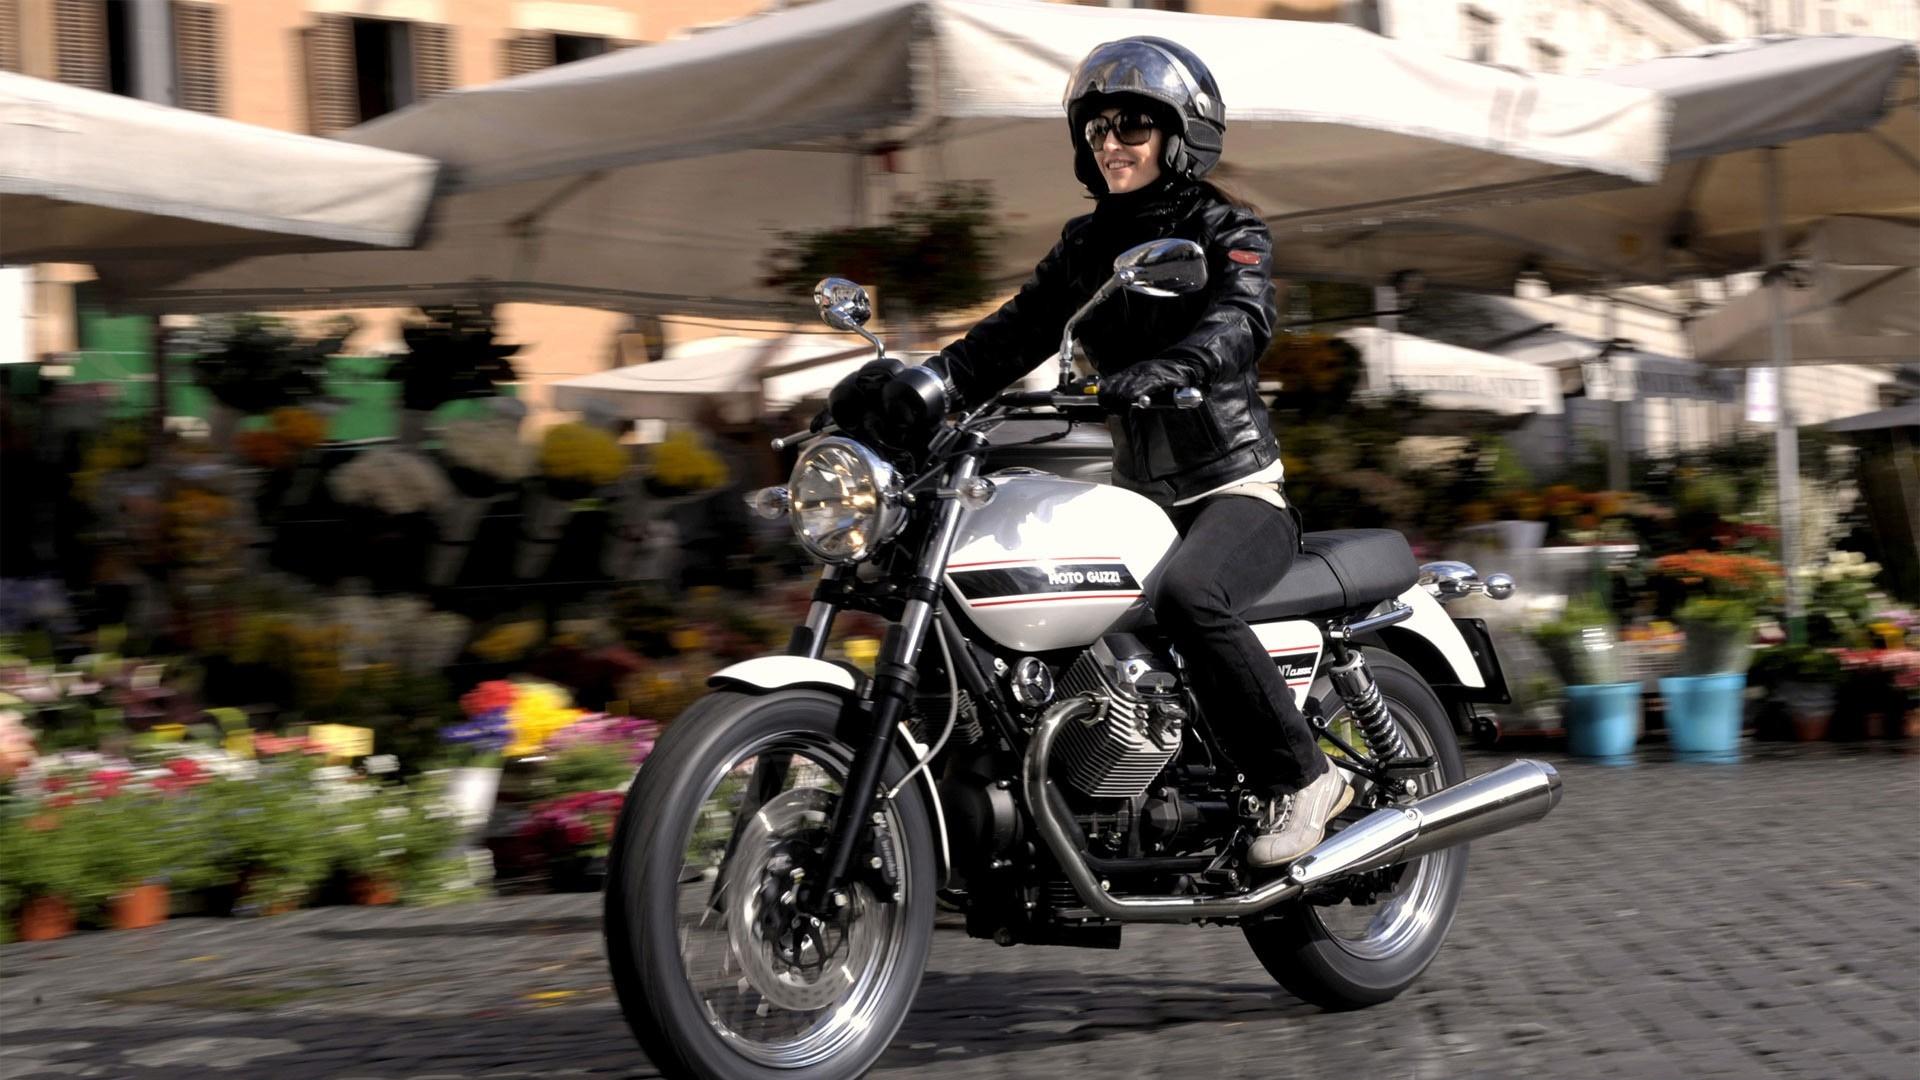 Motorcycle Girl Wallpaper: Wallpaper : Girl, Biker, Motorcycle, Movement, Speed